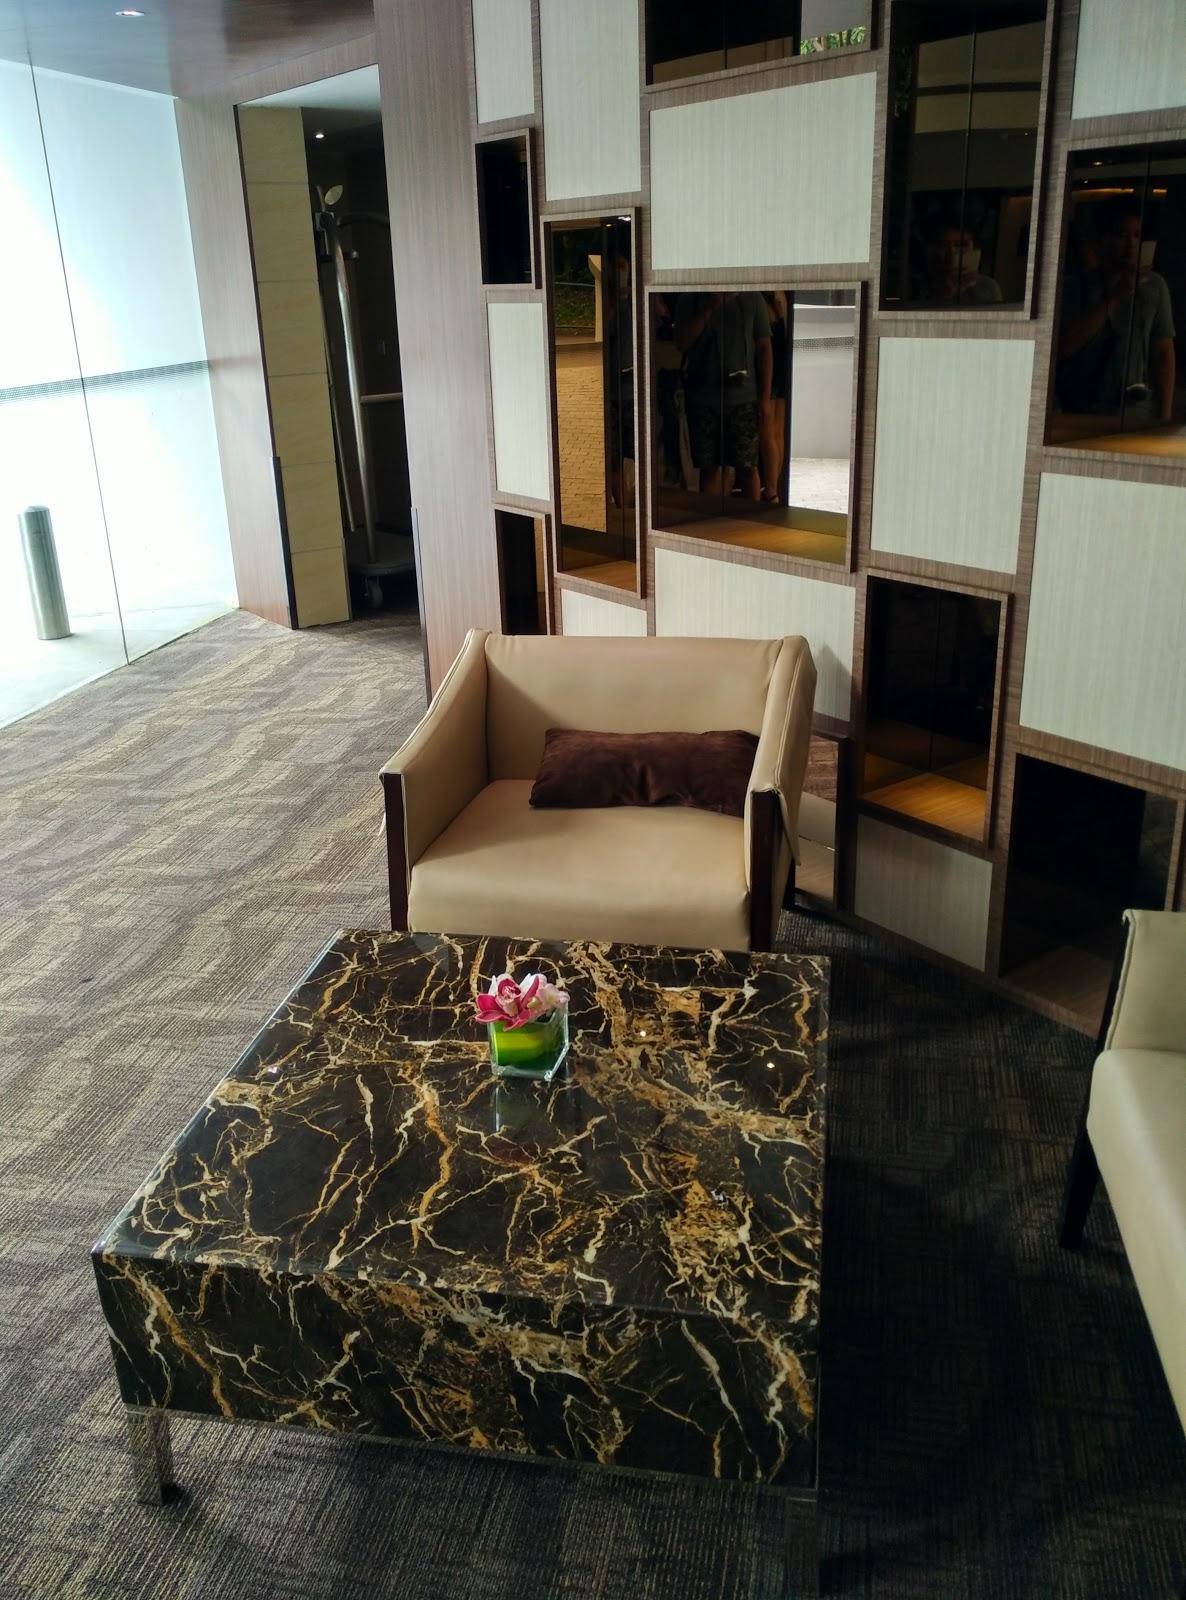 7 Star Hotel Rooms: Hotel Review: Bay Hotel Deluxe Queen Room